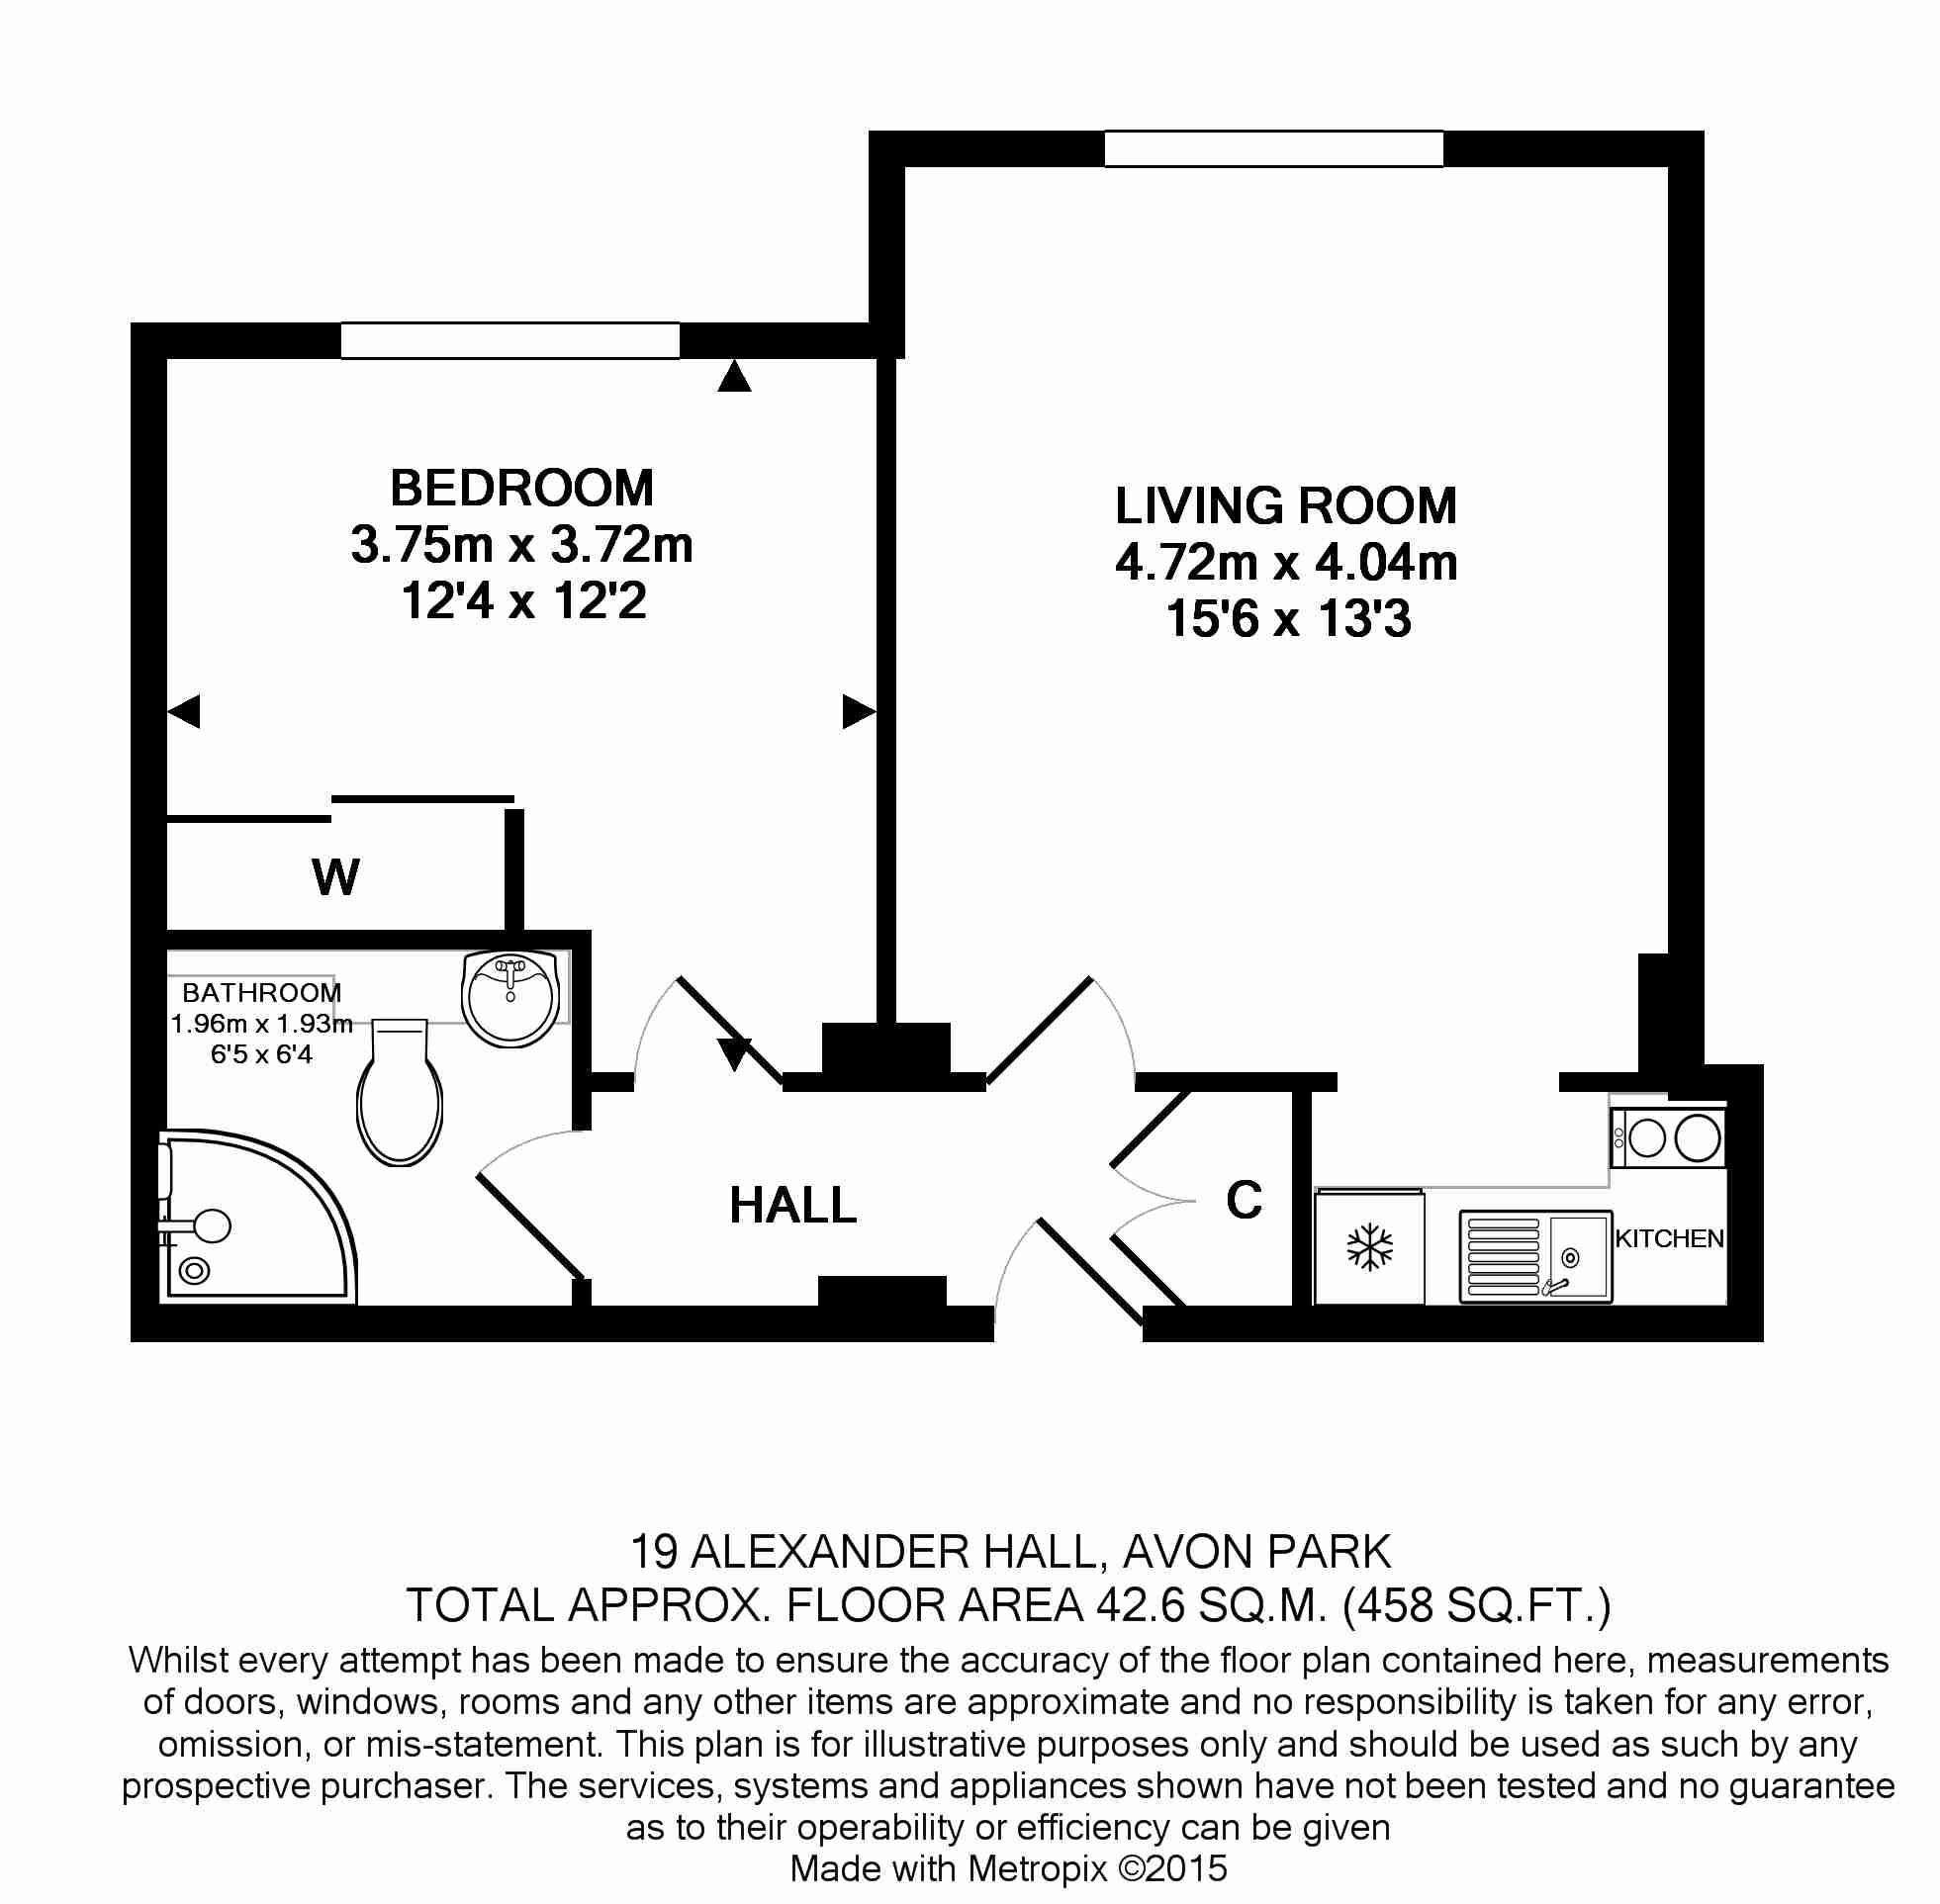 19 Alexander Hall Floorplan